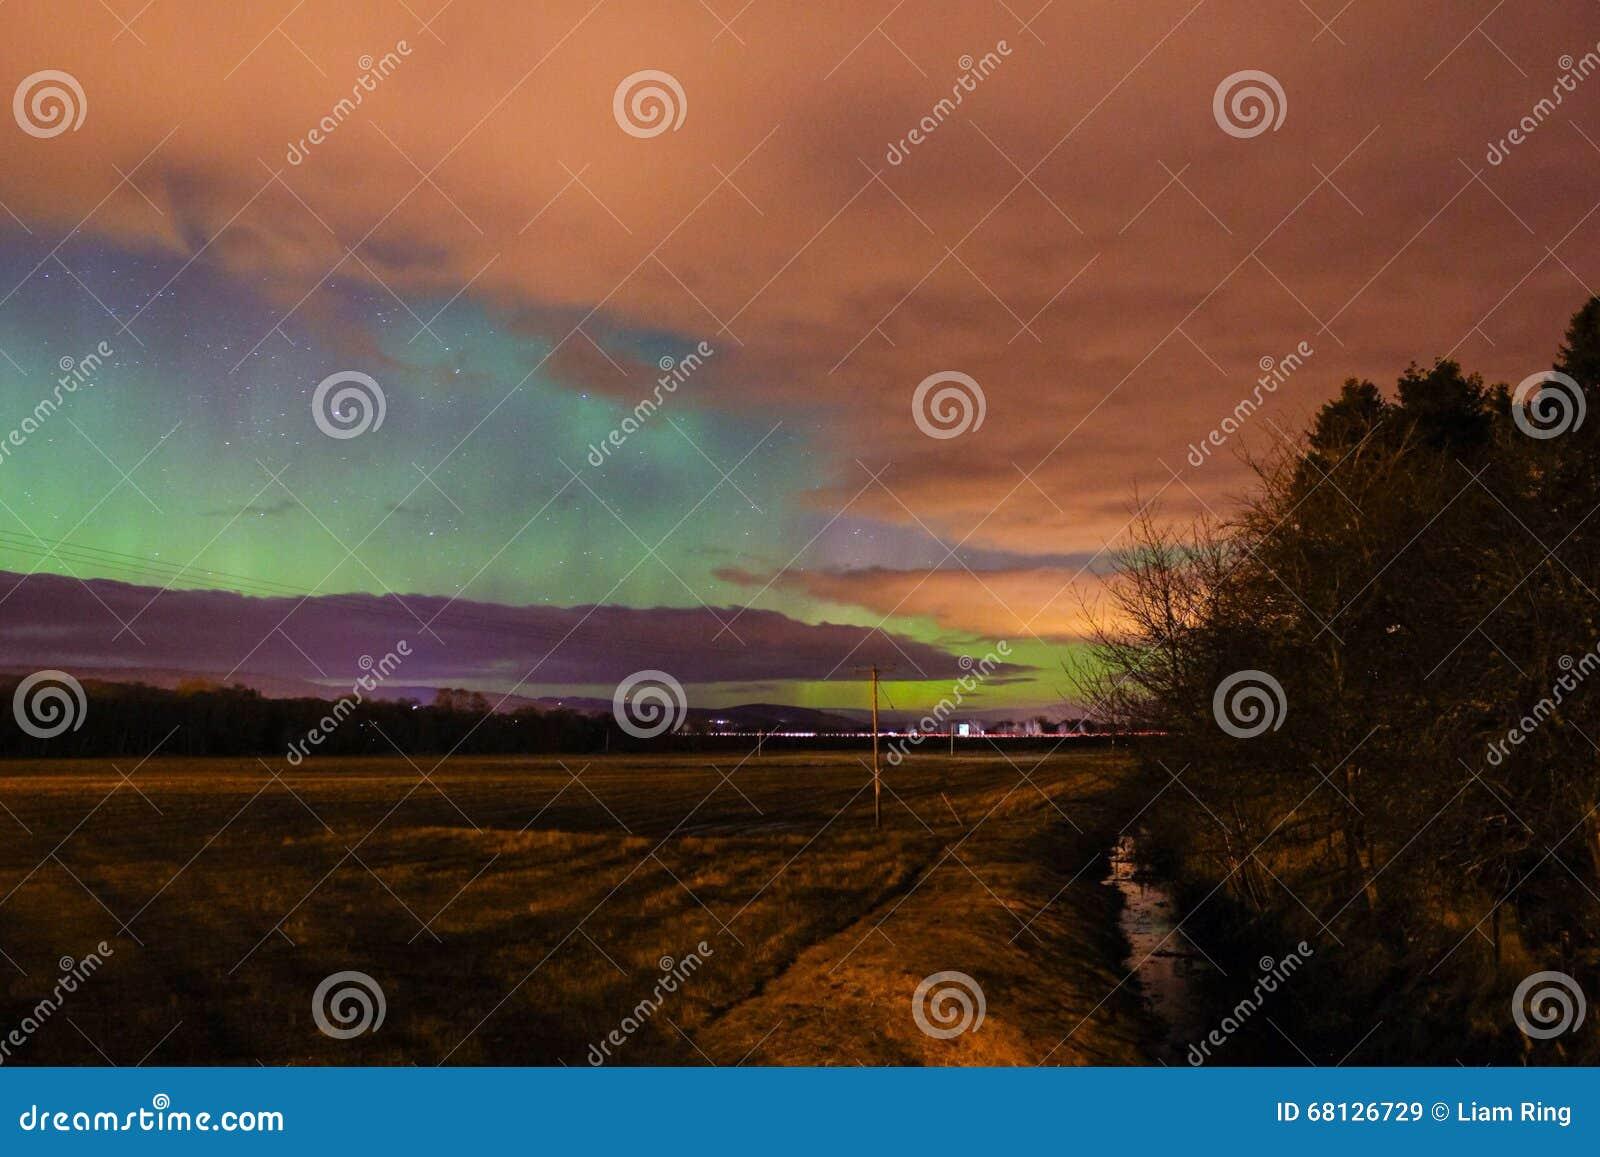 Aurora borealis northern lights in Scotland